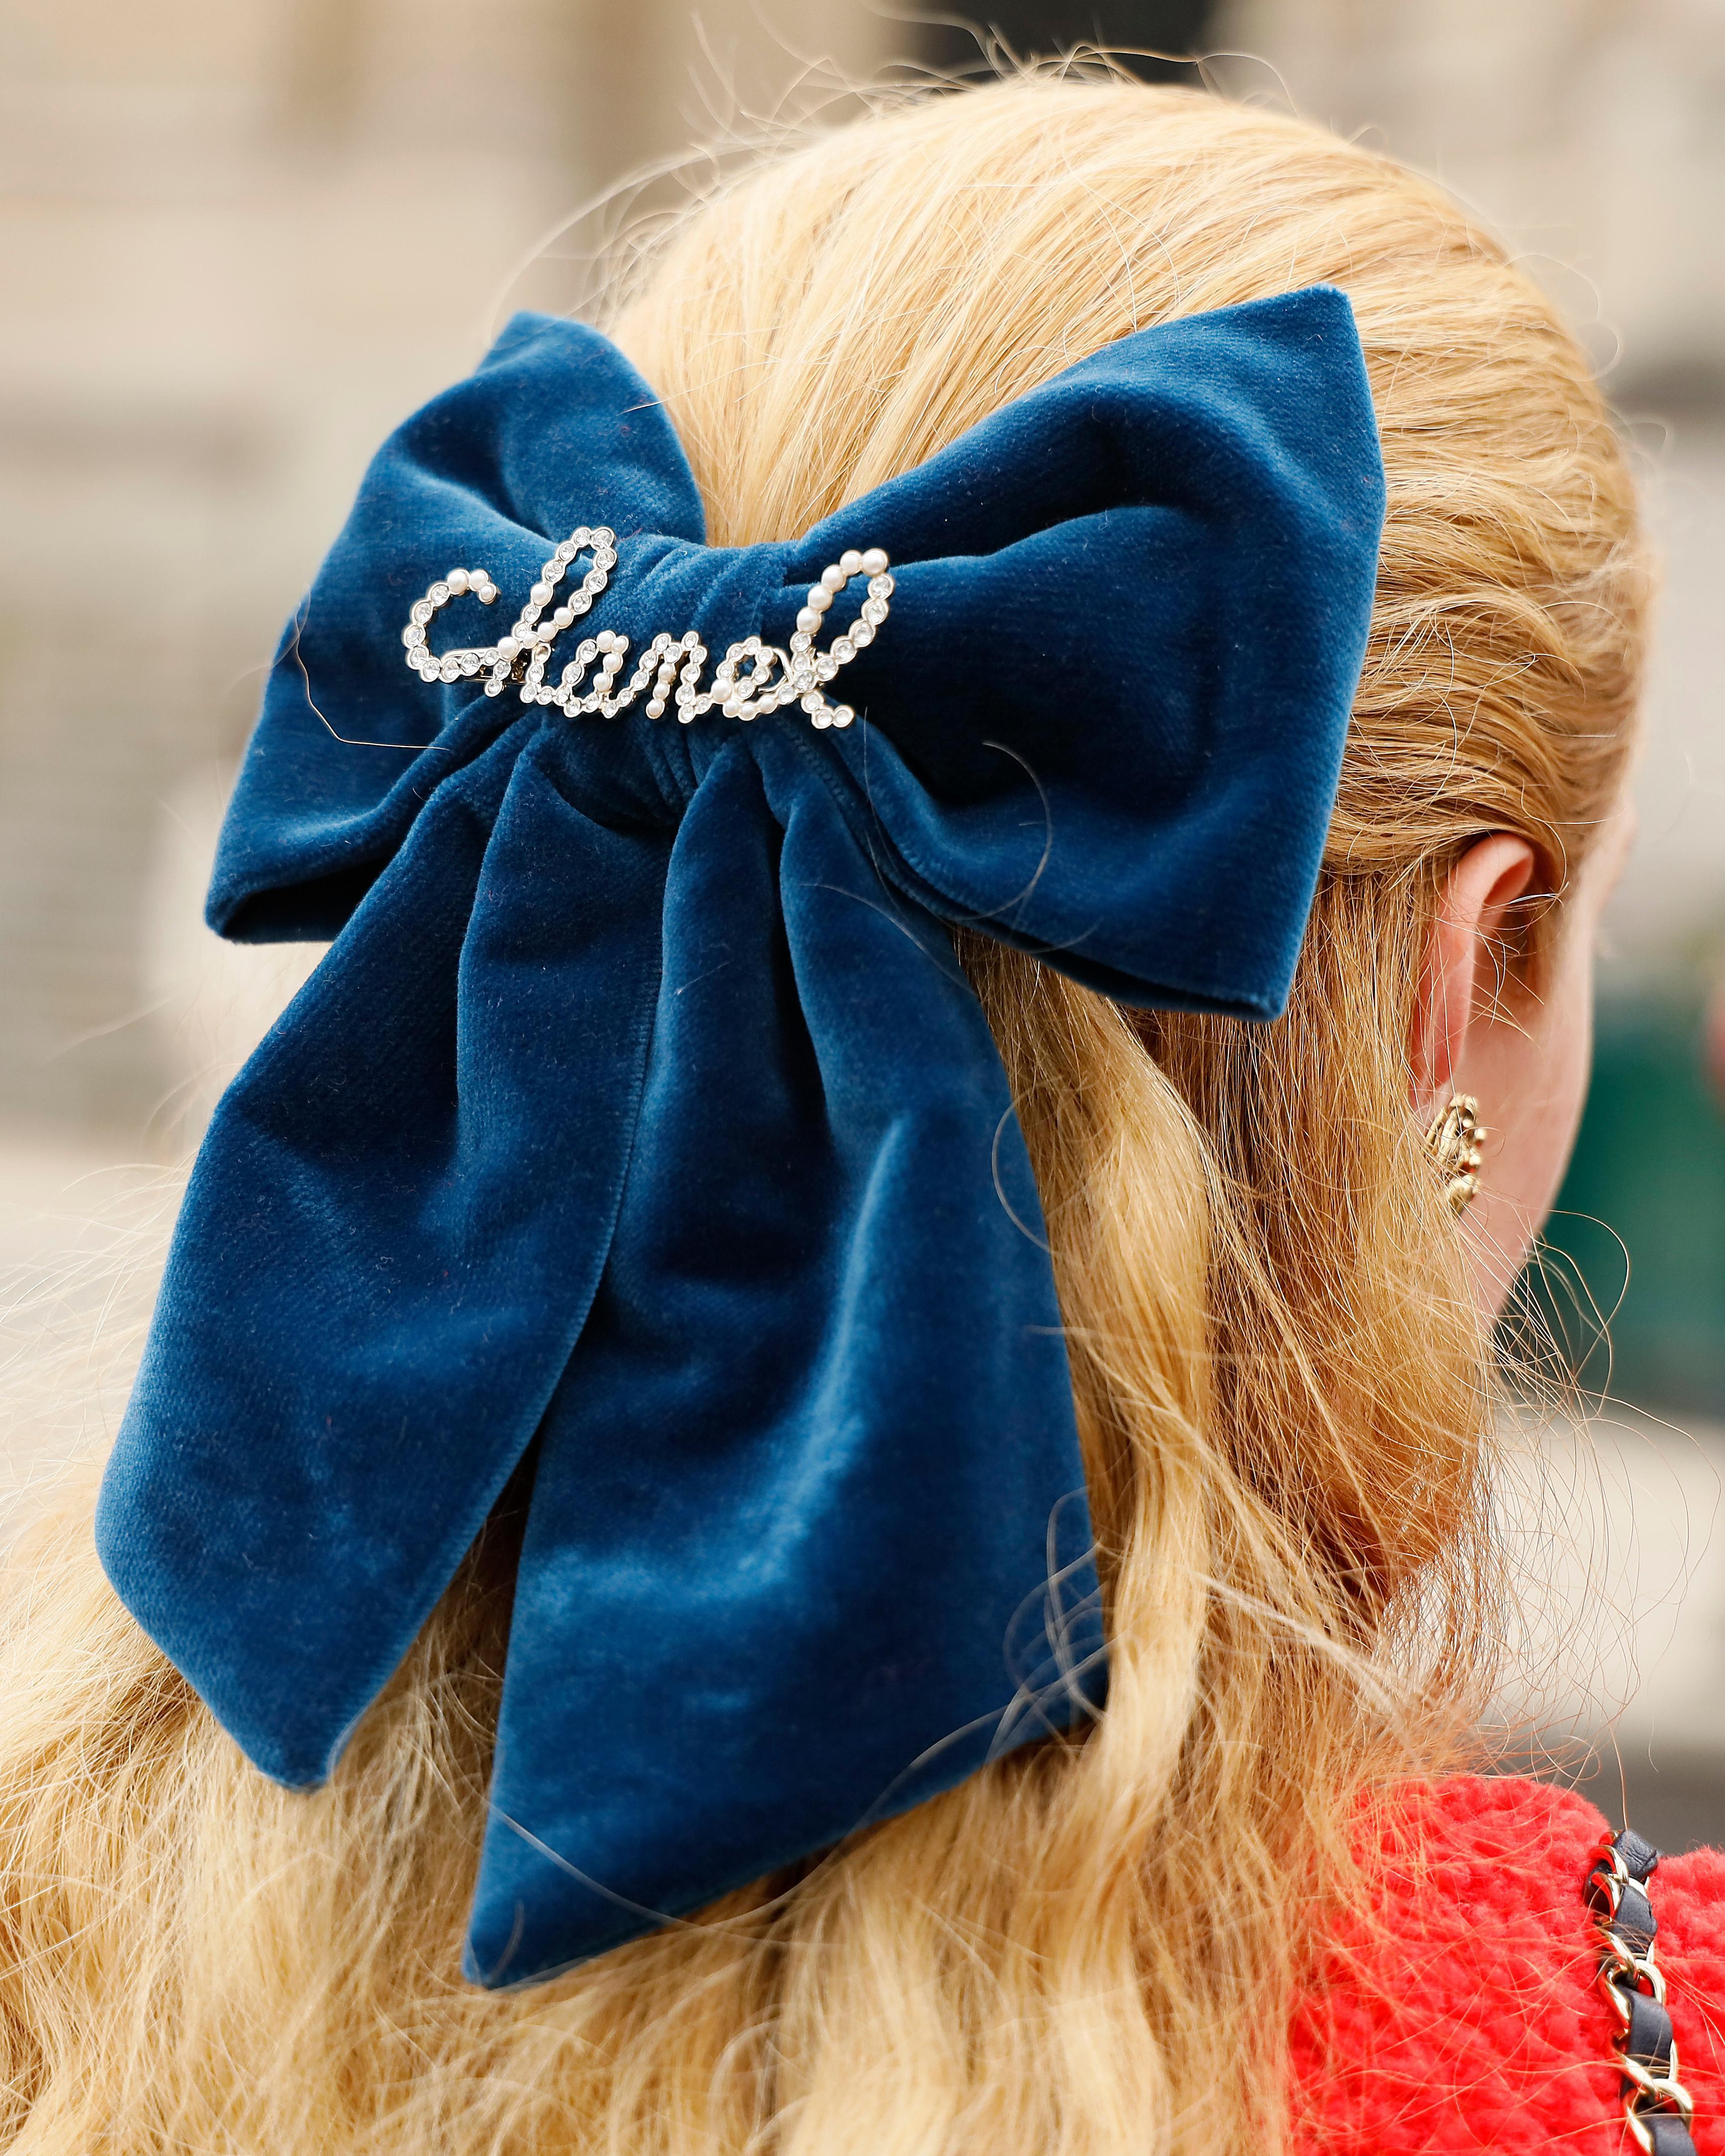 Streamlined Chanel collection shines in Paris despite catwalk crasher